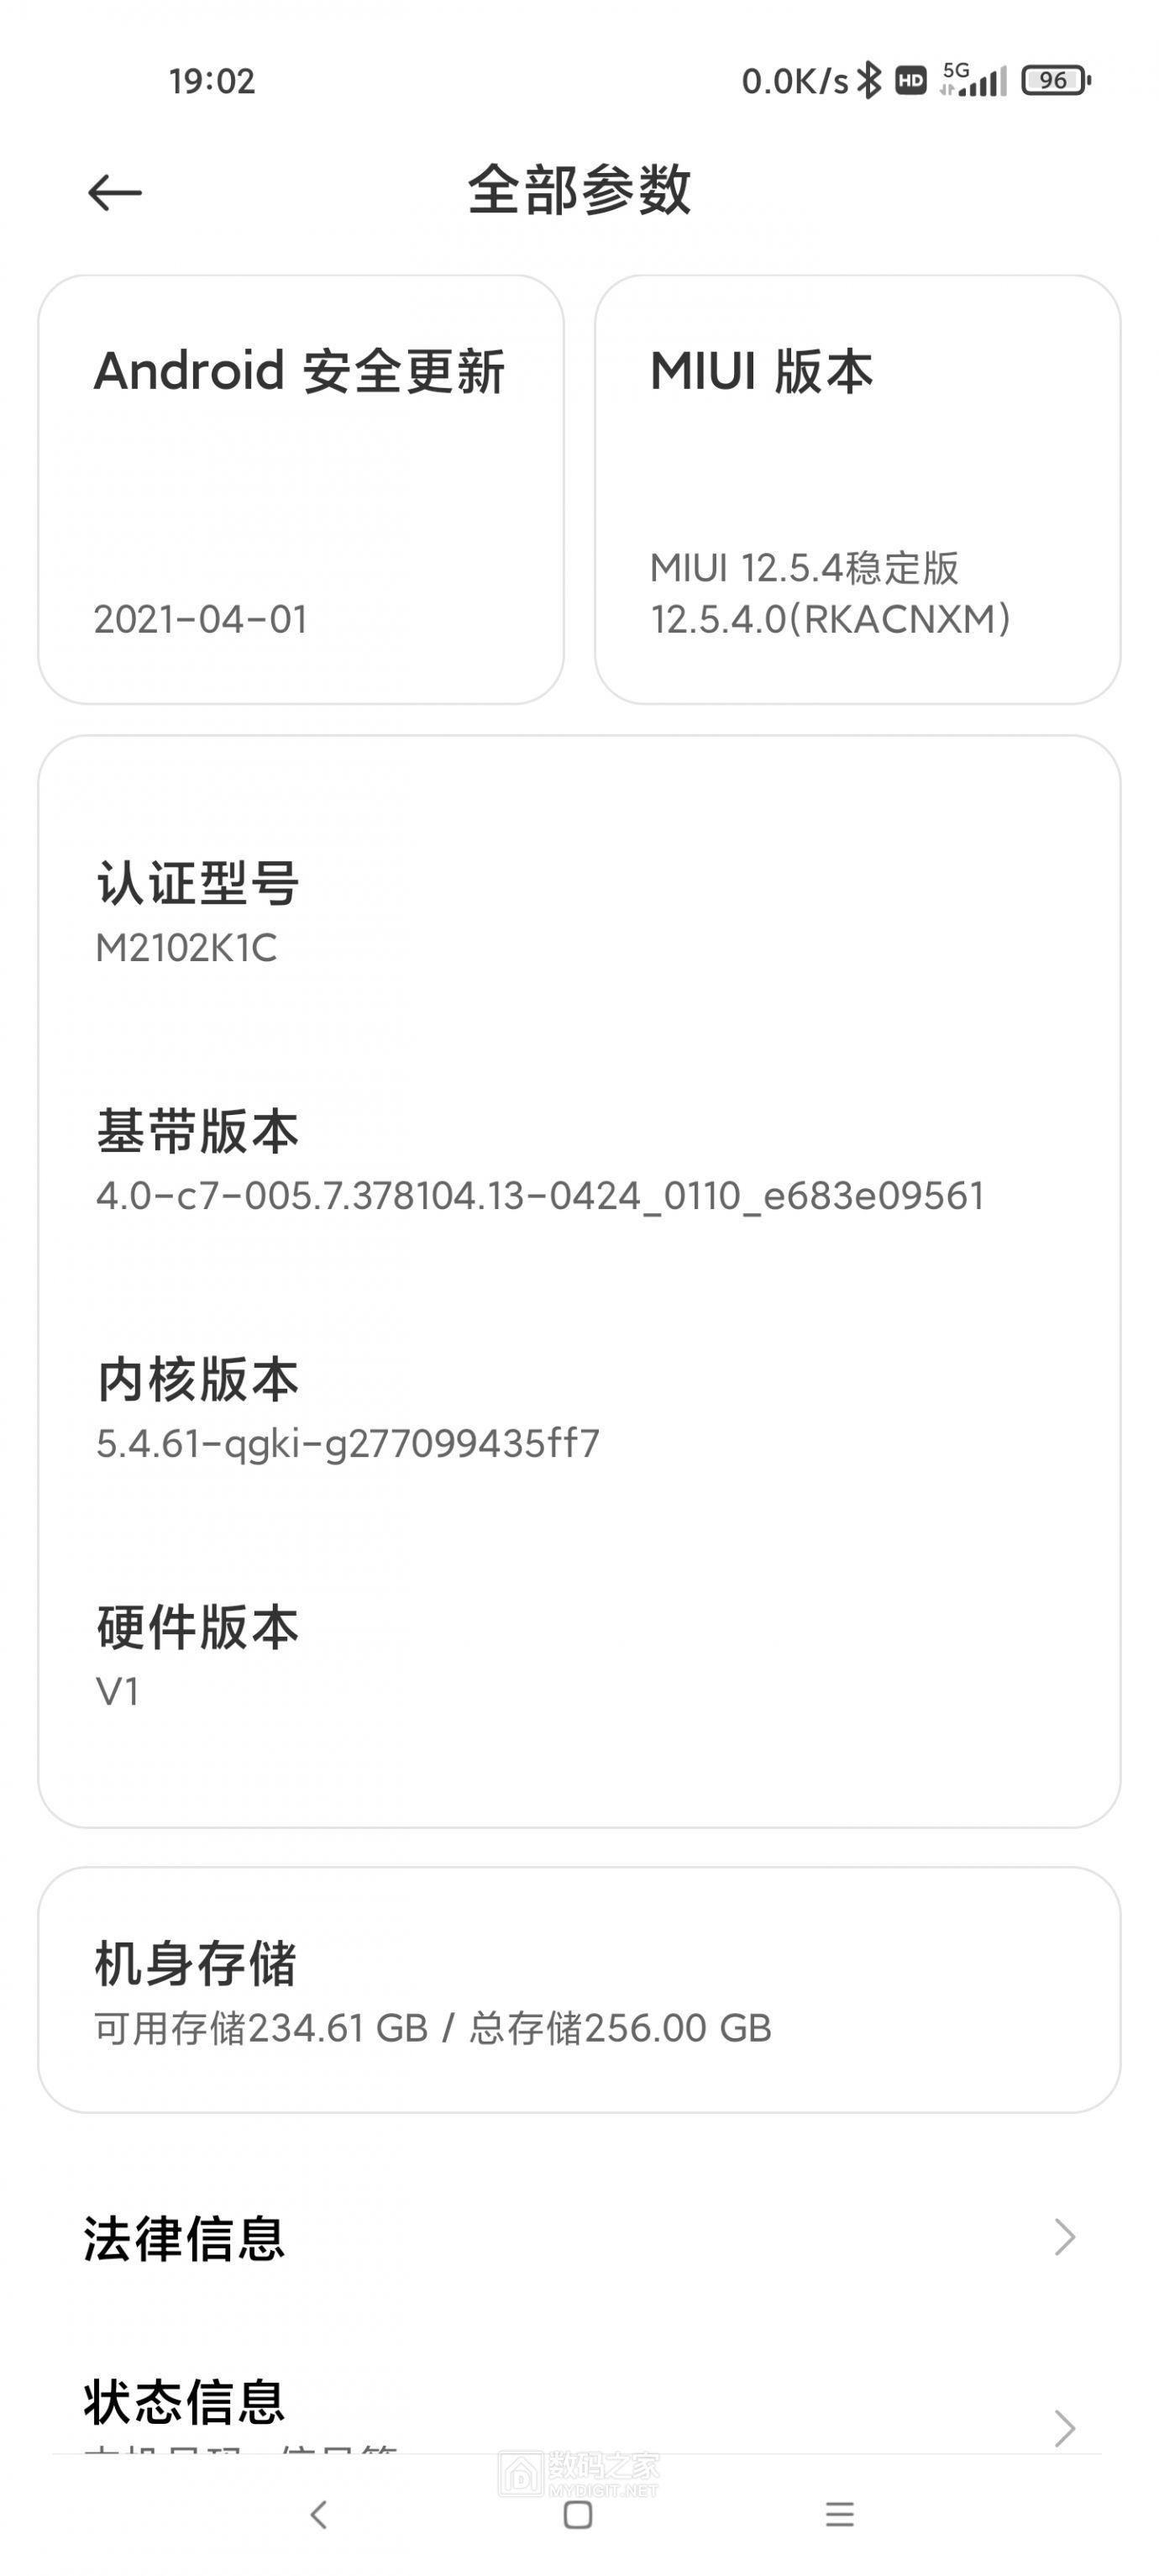 Screenshot_2021-05-11-19-02-40-966_com.android.settings.jpg